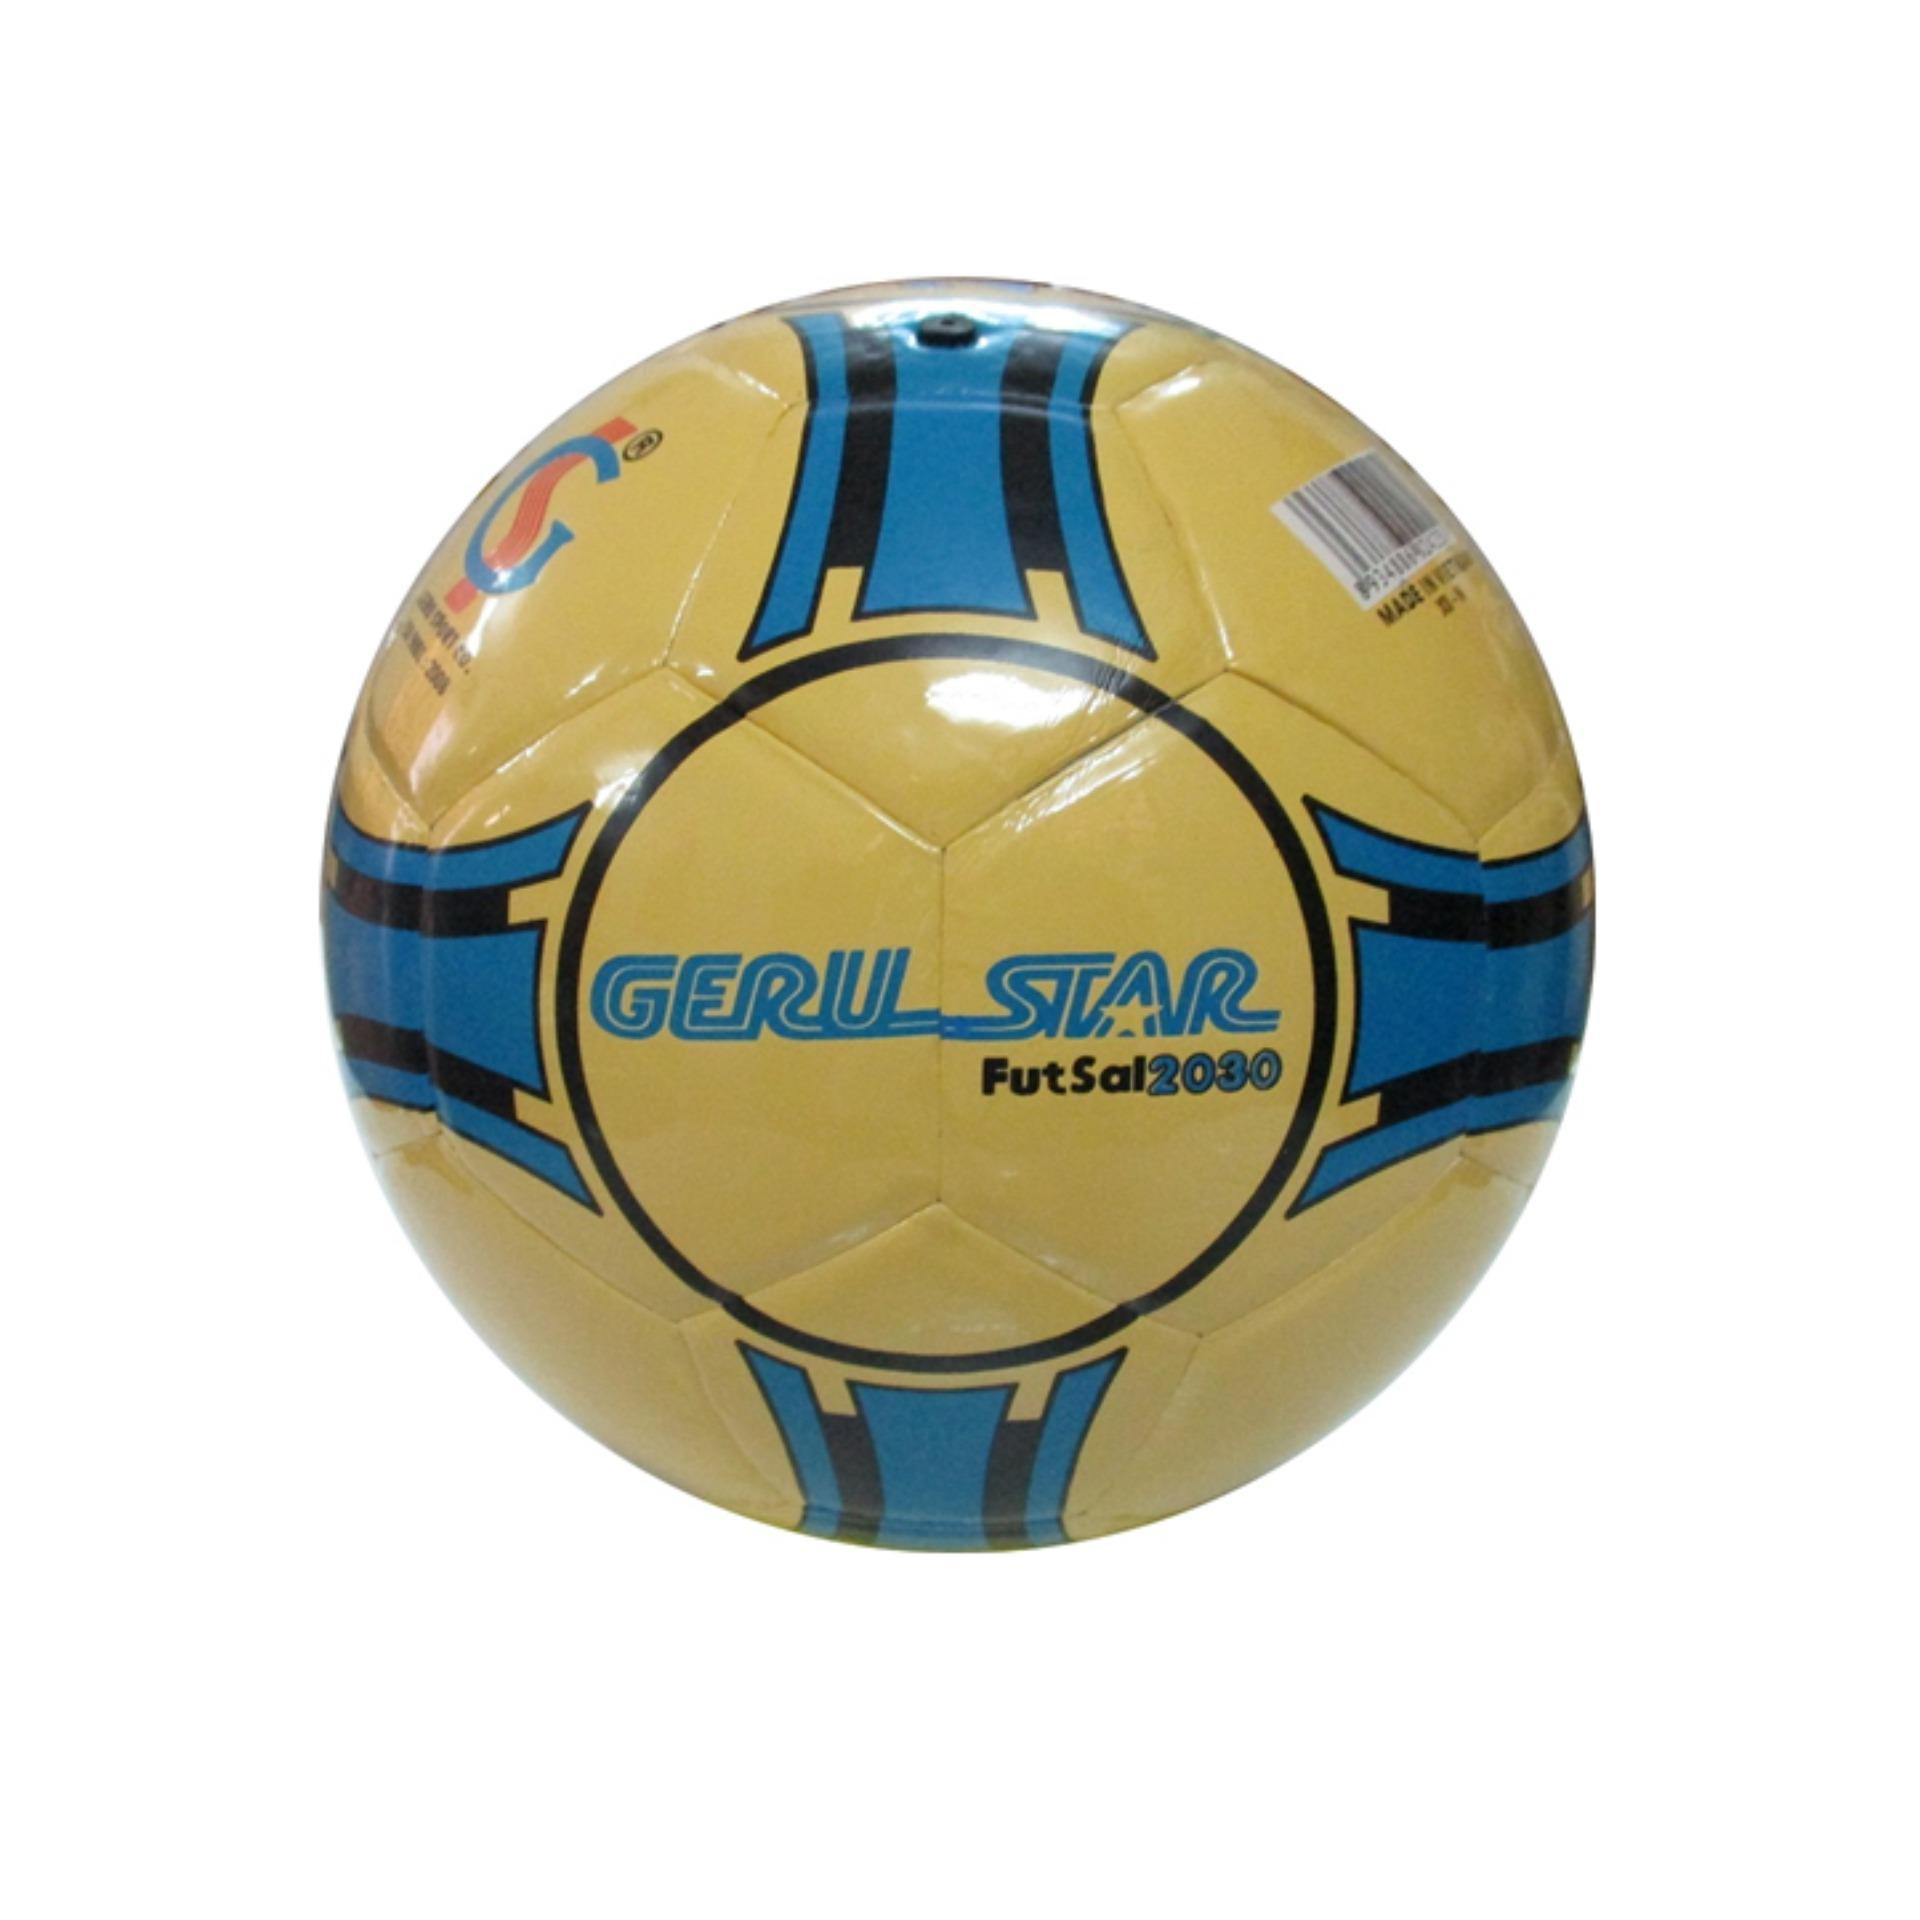 Bóng Futsal 2030